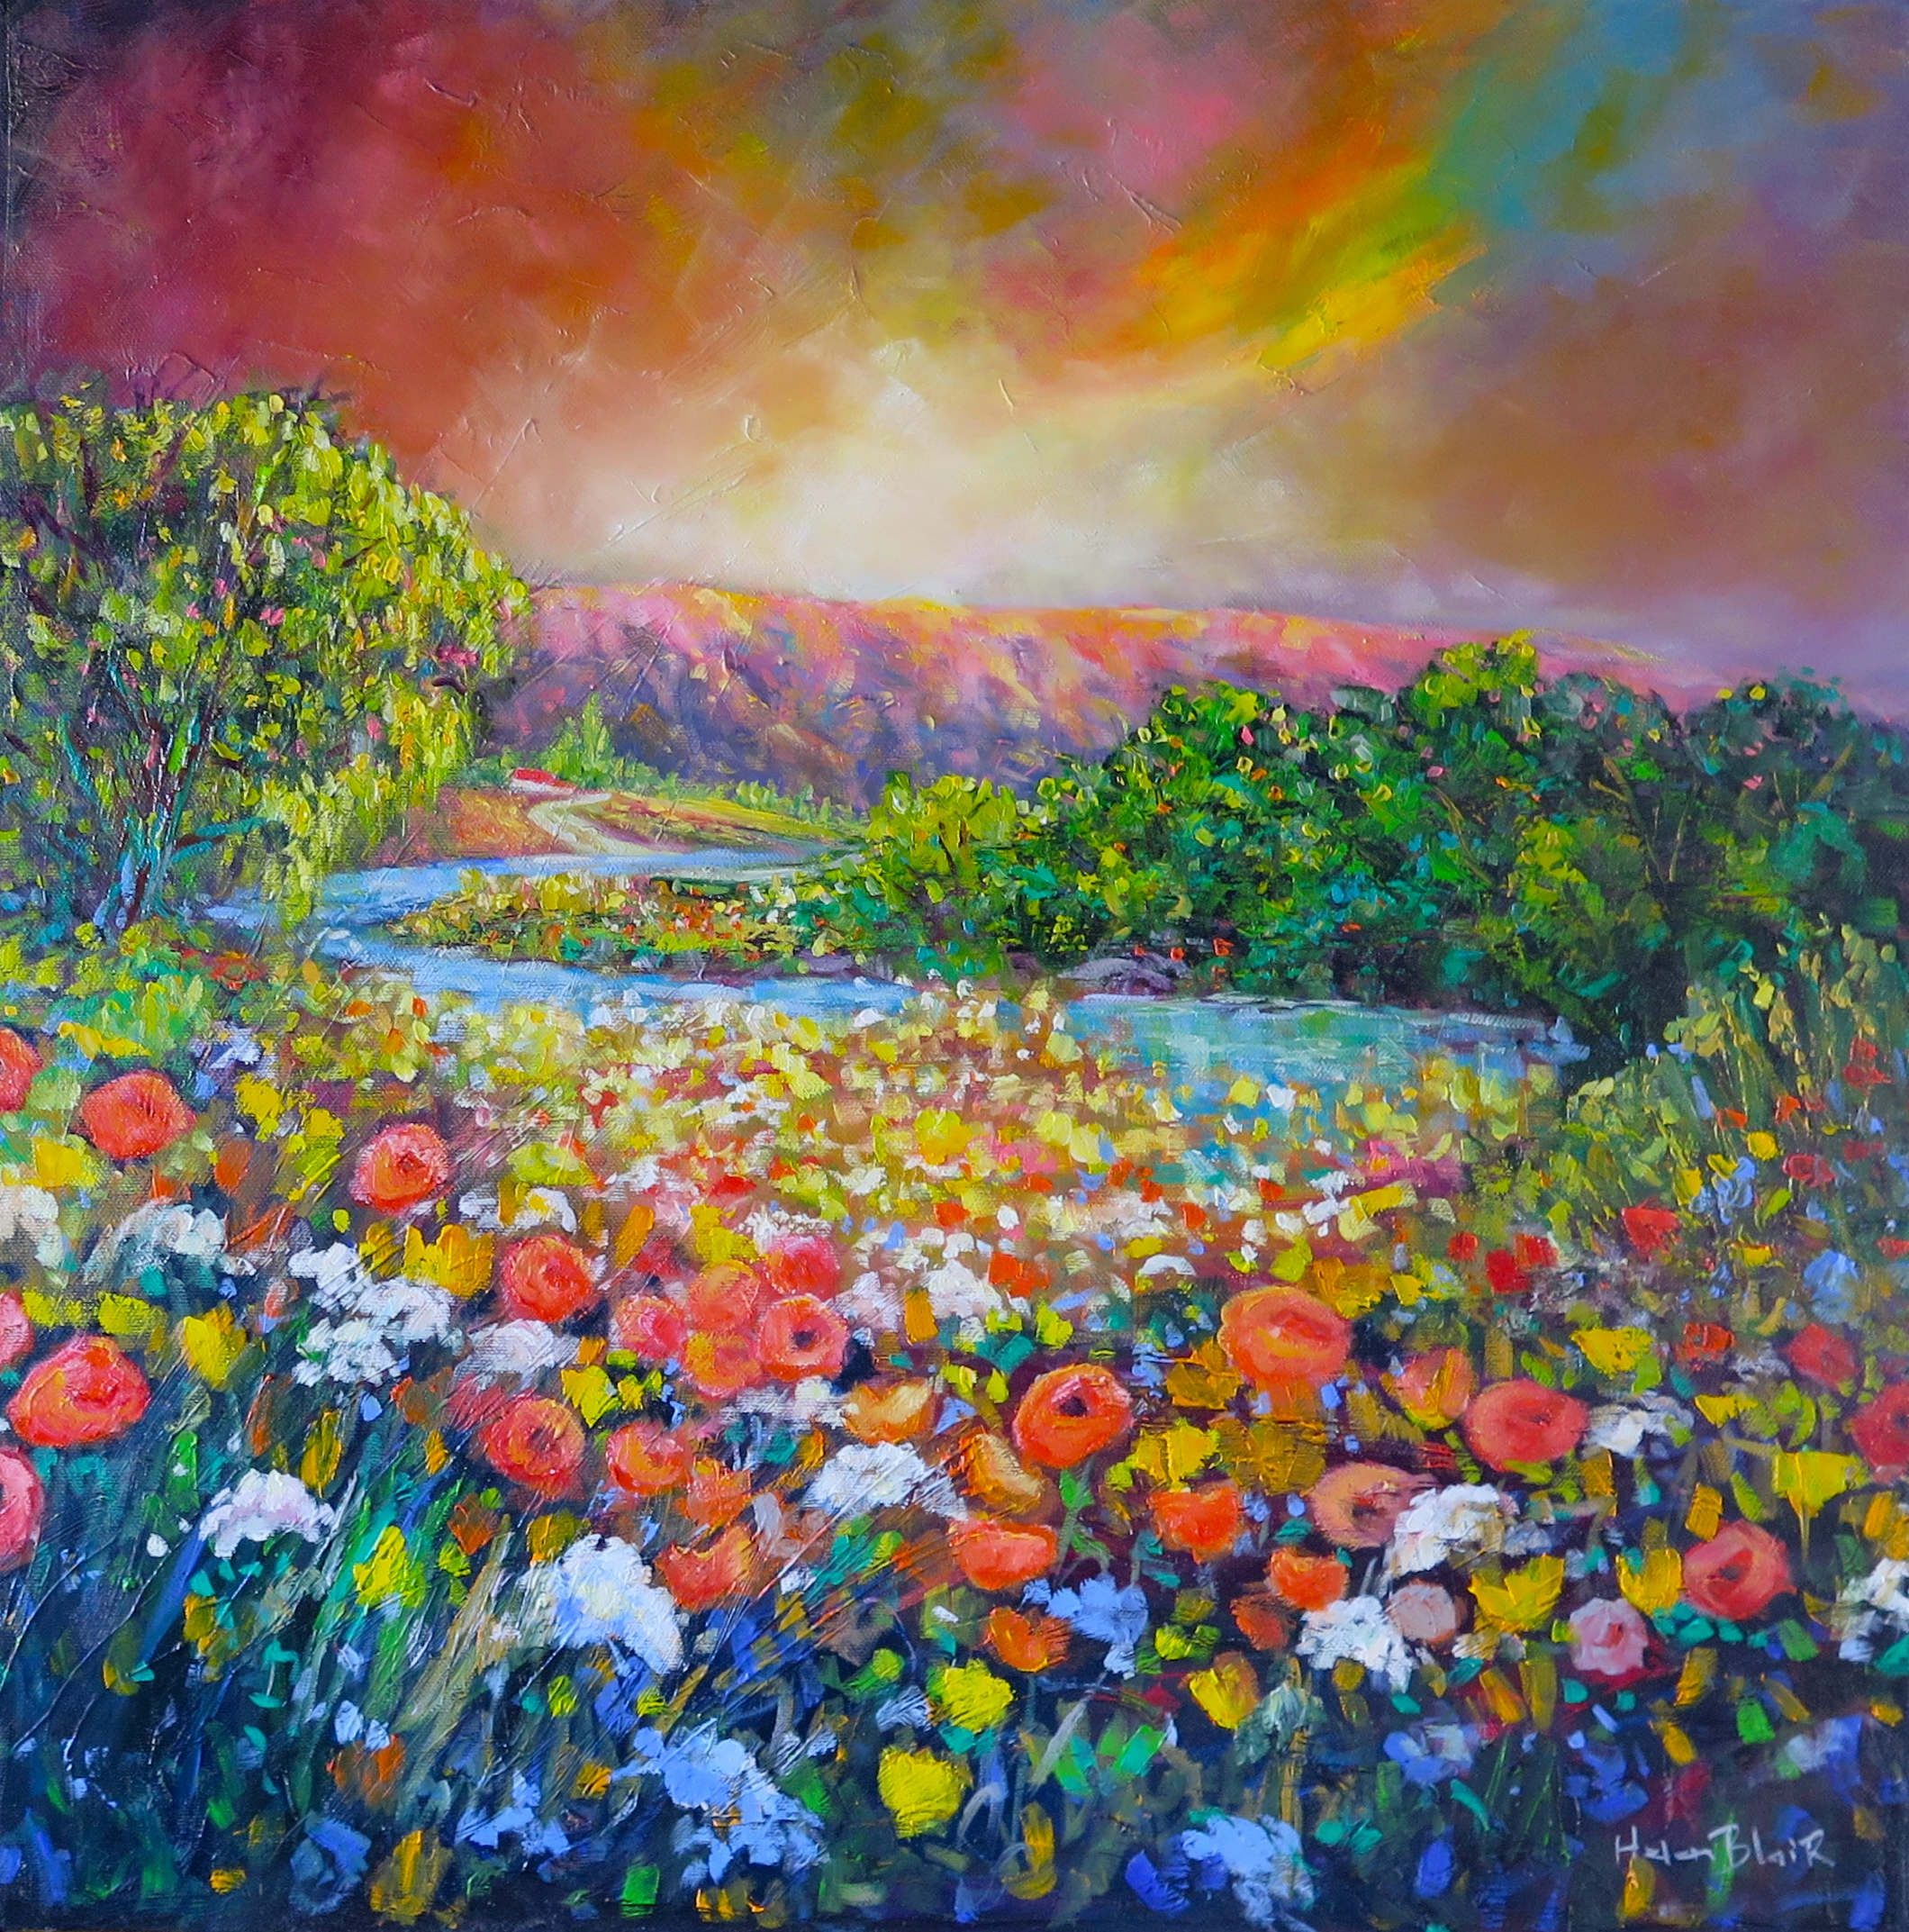 Otago Wild Flowers, helenblairsart